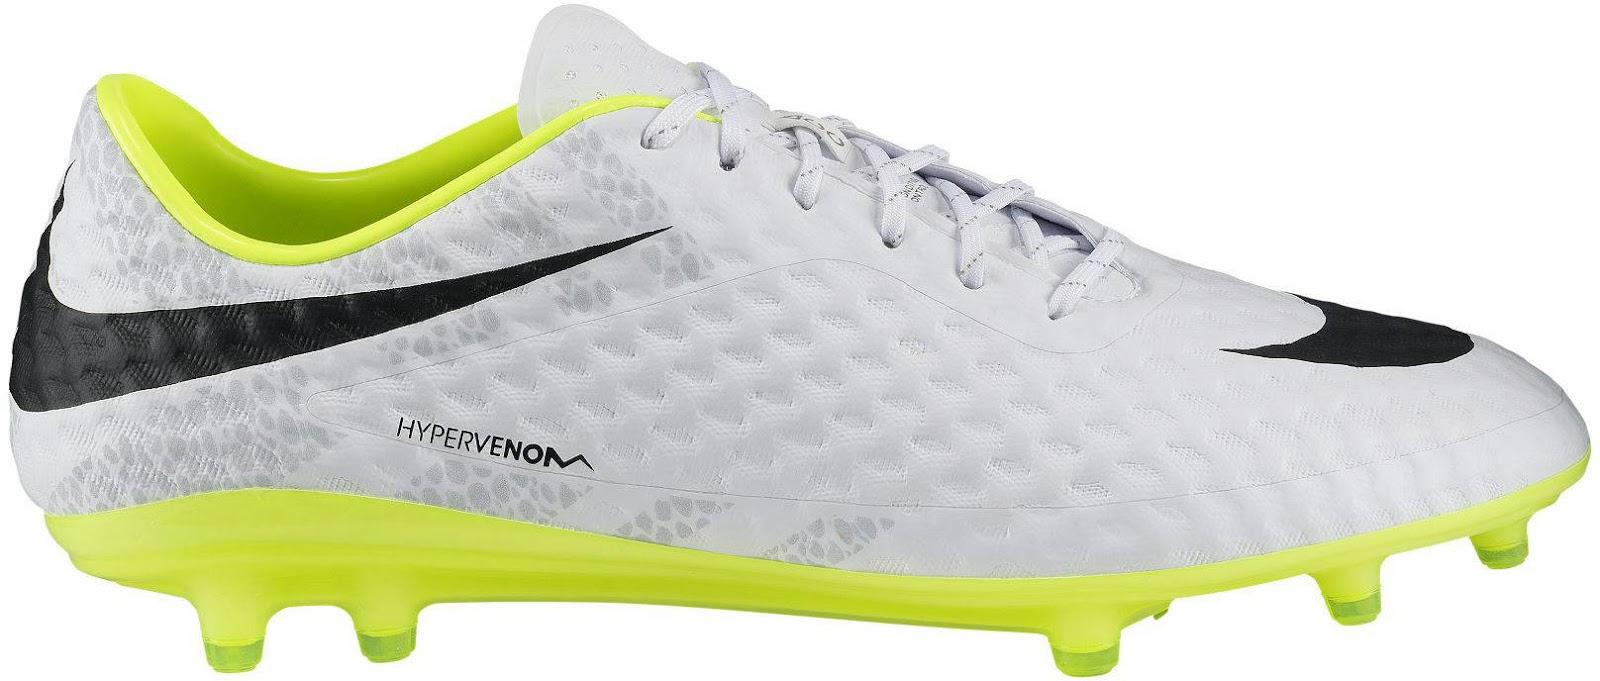 231e869b9d29 Reflective Nike Hypervenom Phantom 2014 Boot Released - Sports kicks